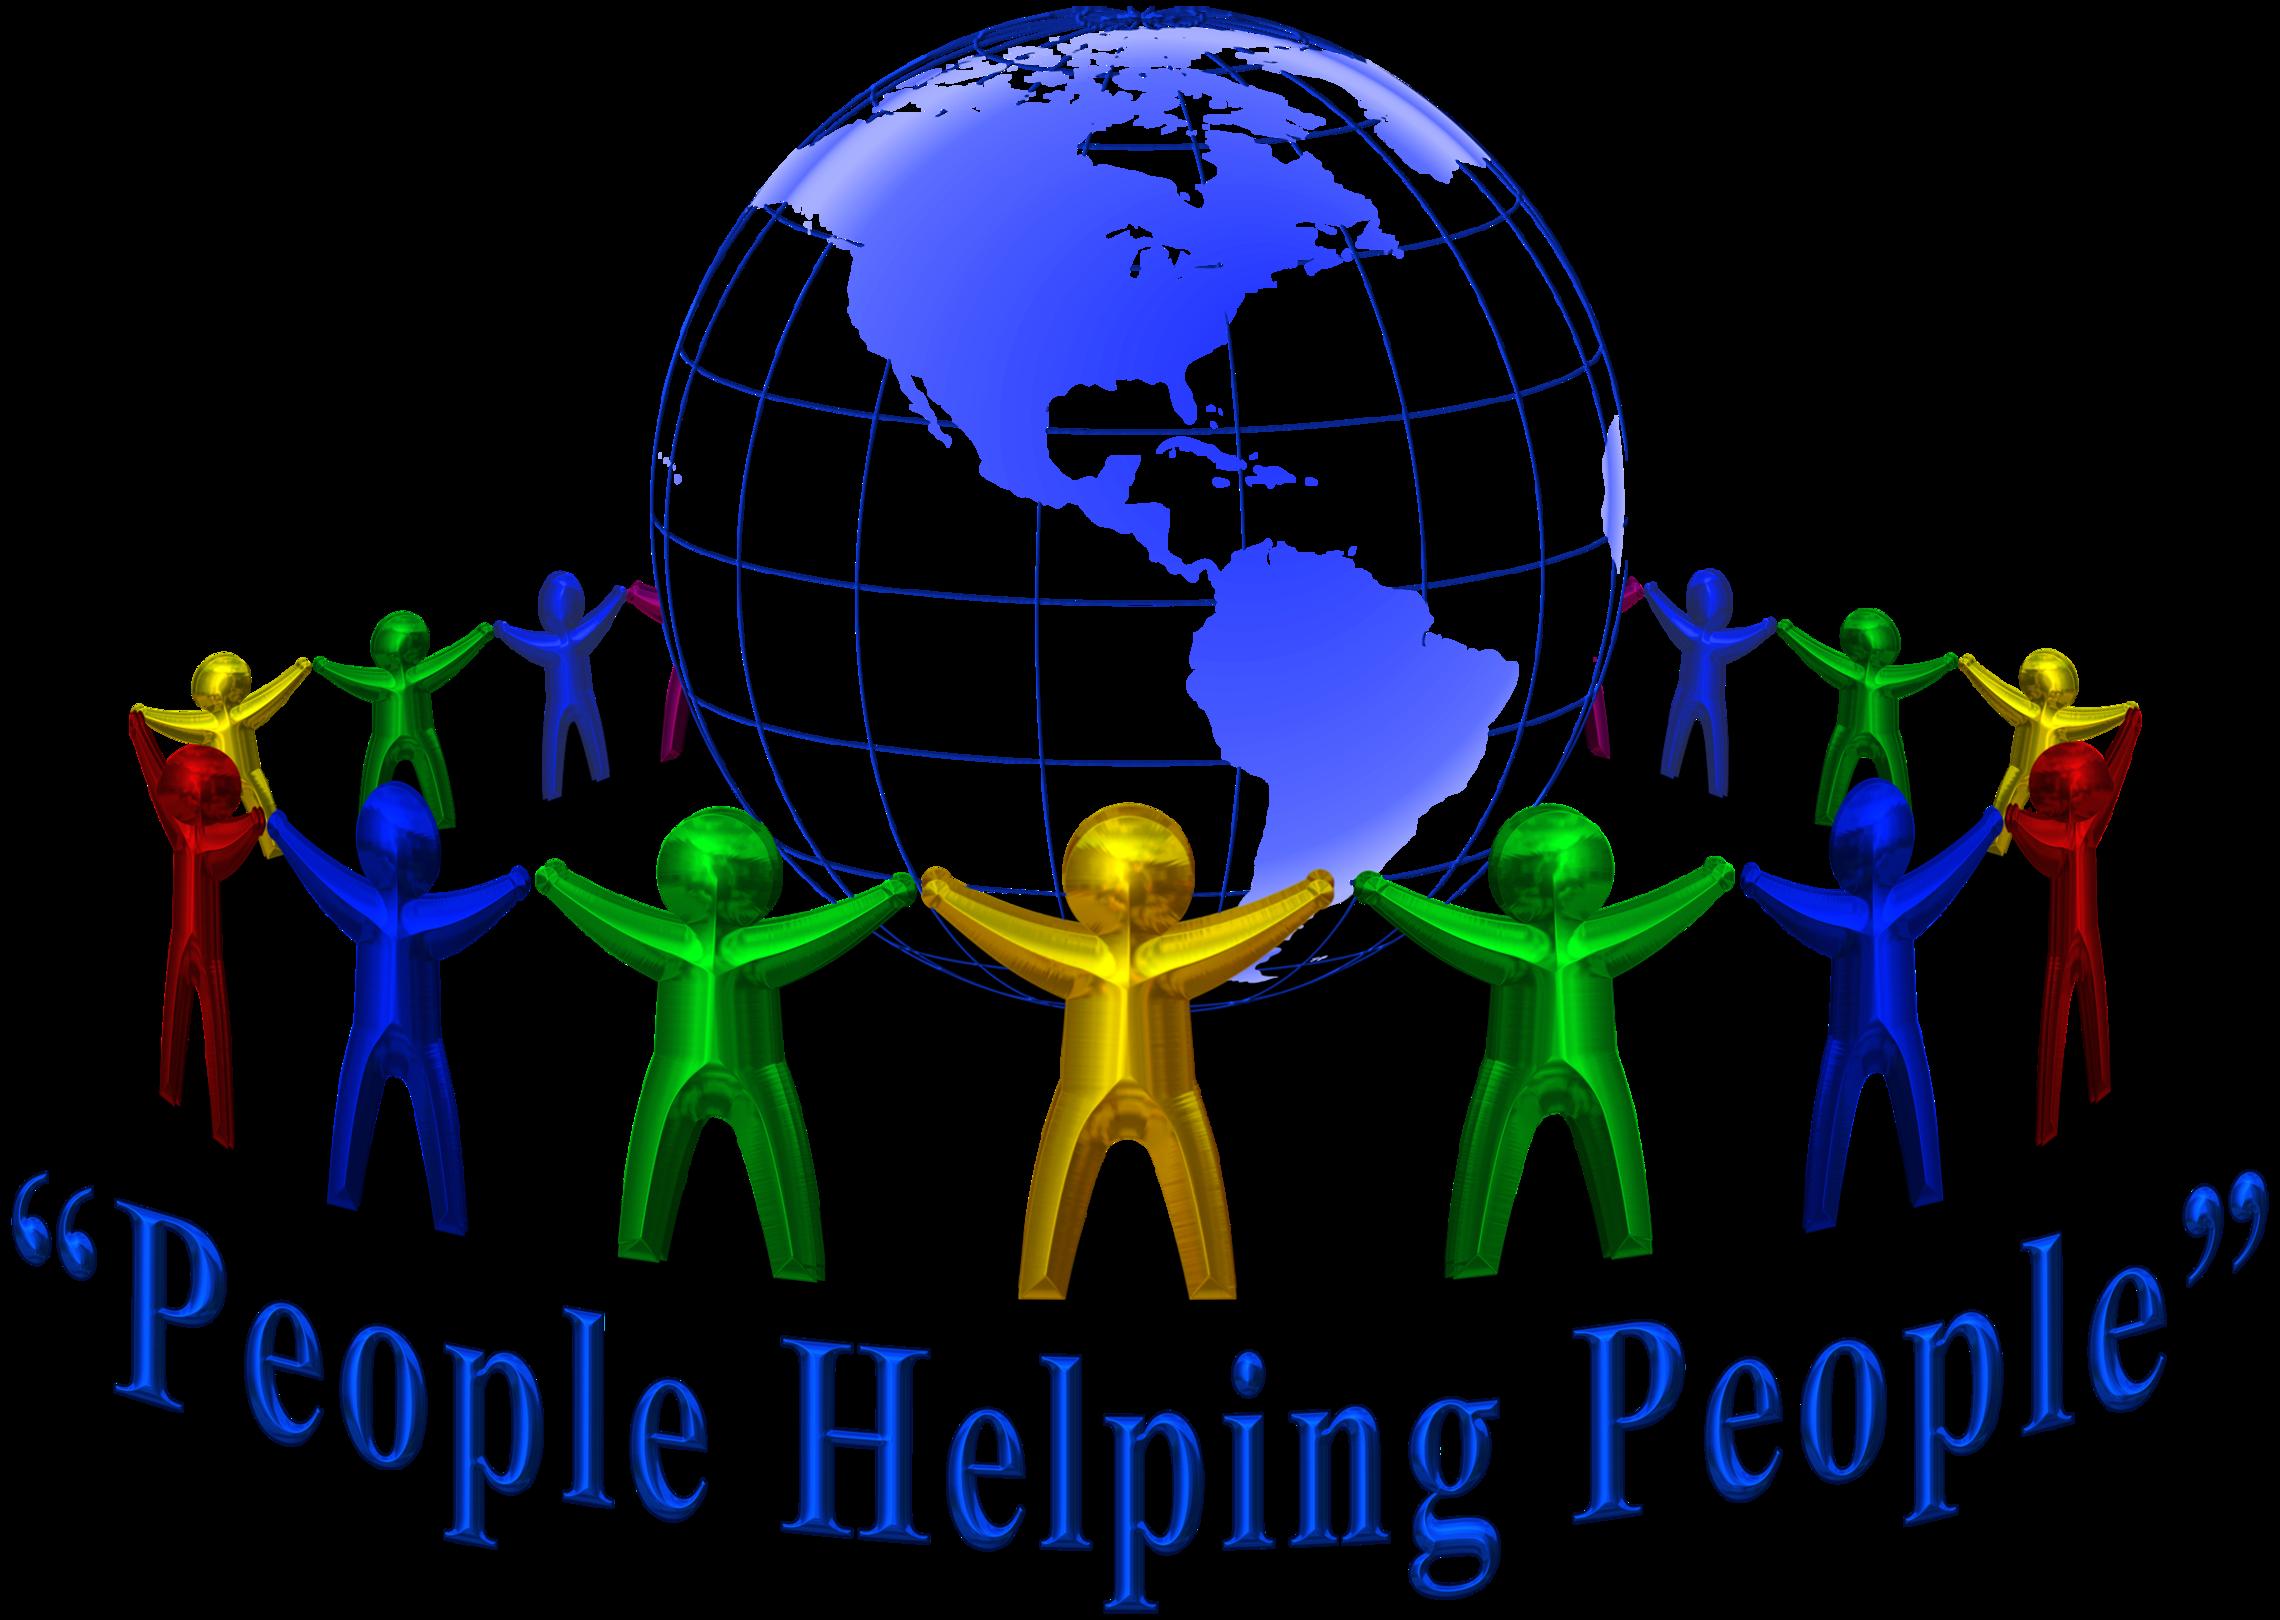 Delegates cmtc ovm us. Clipart world global community